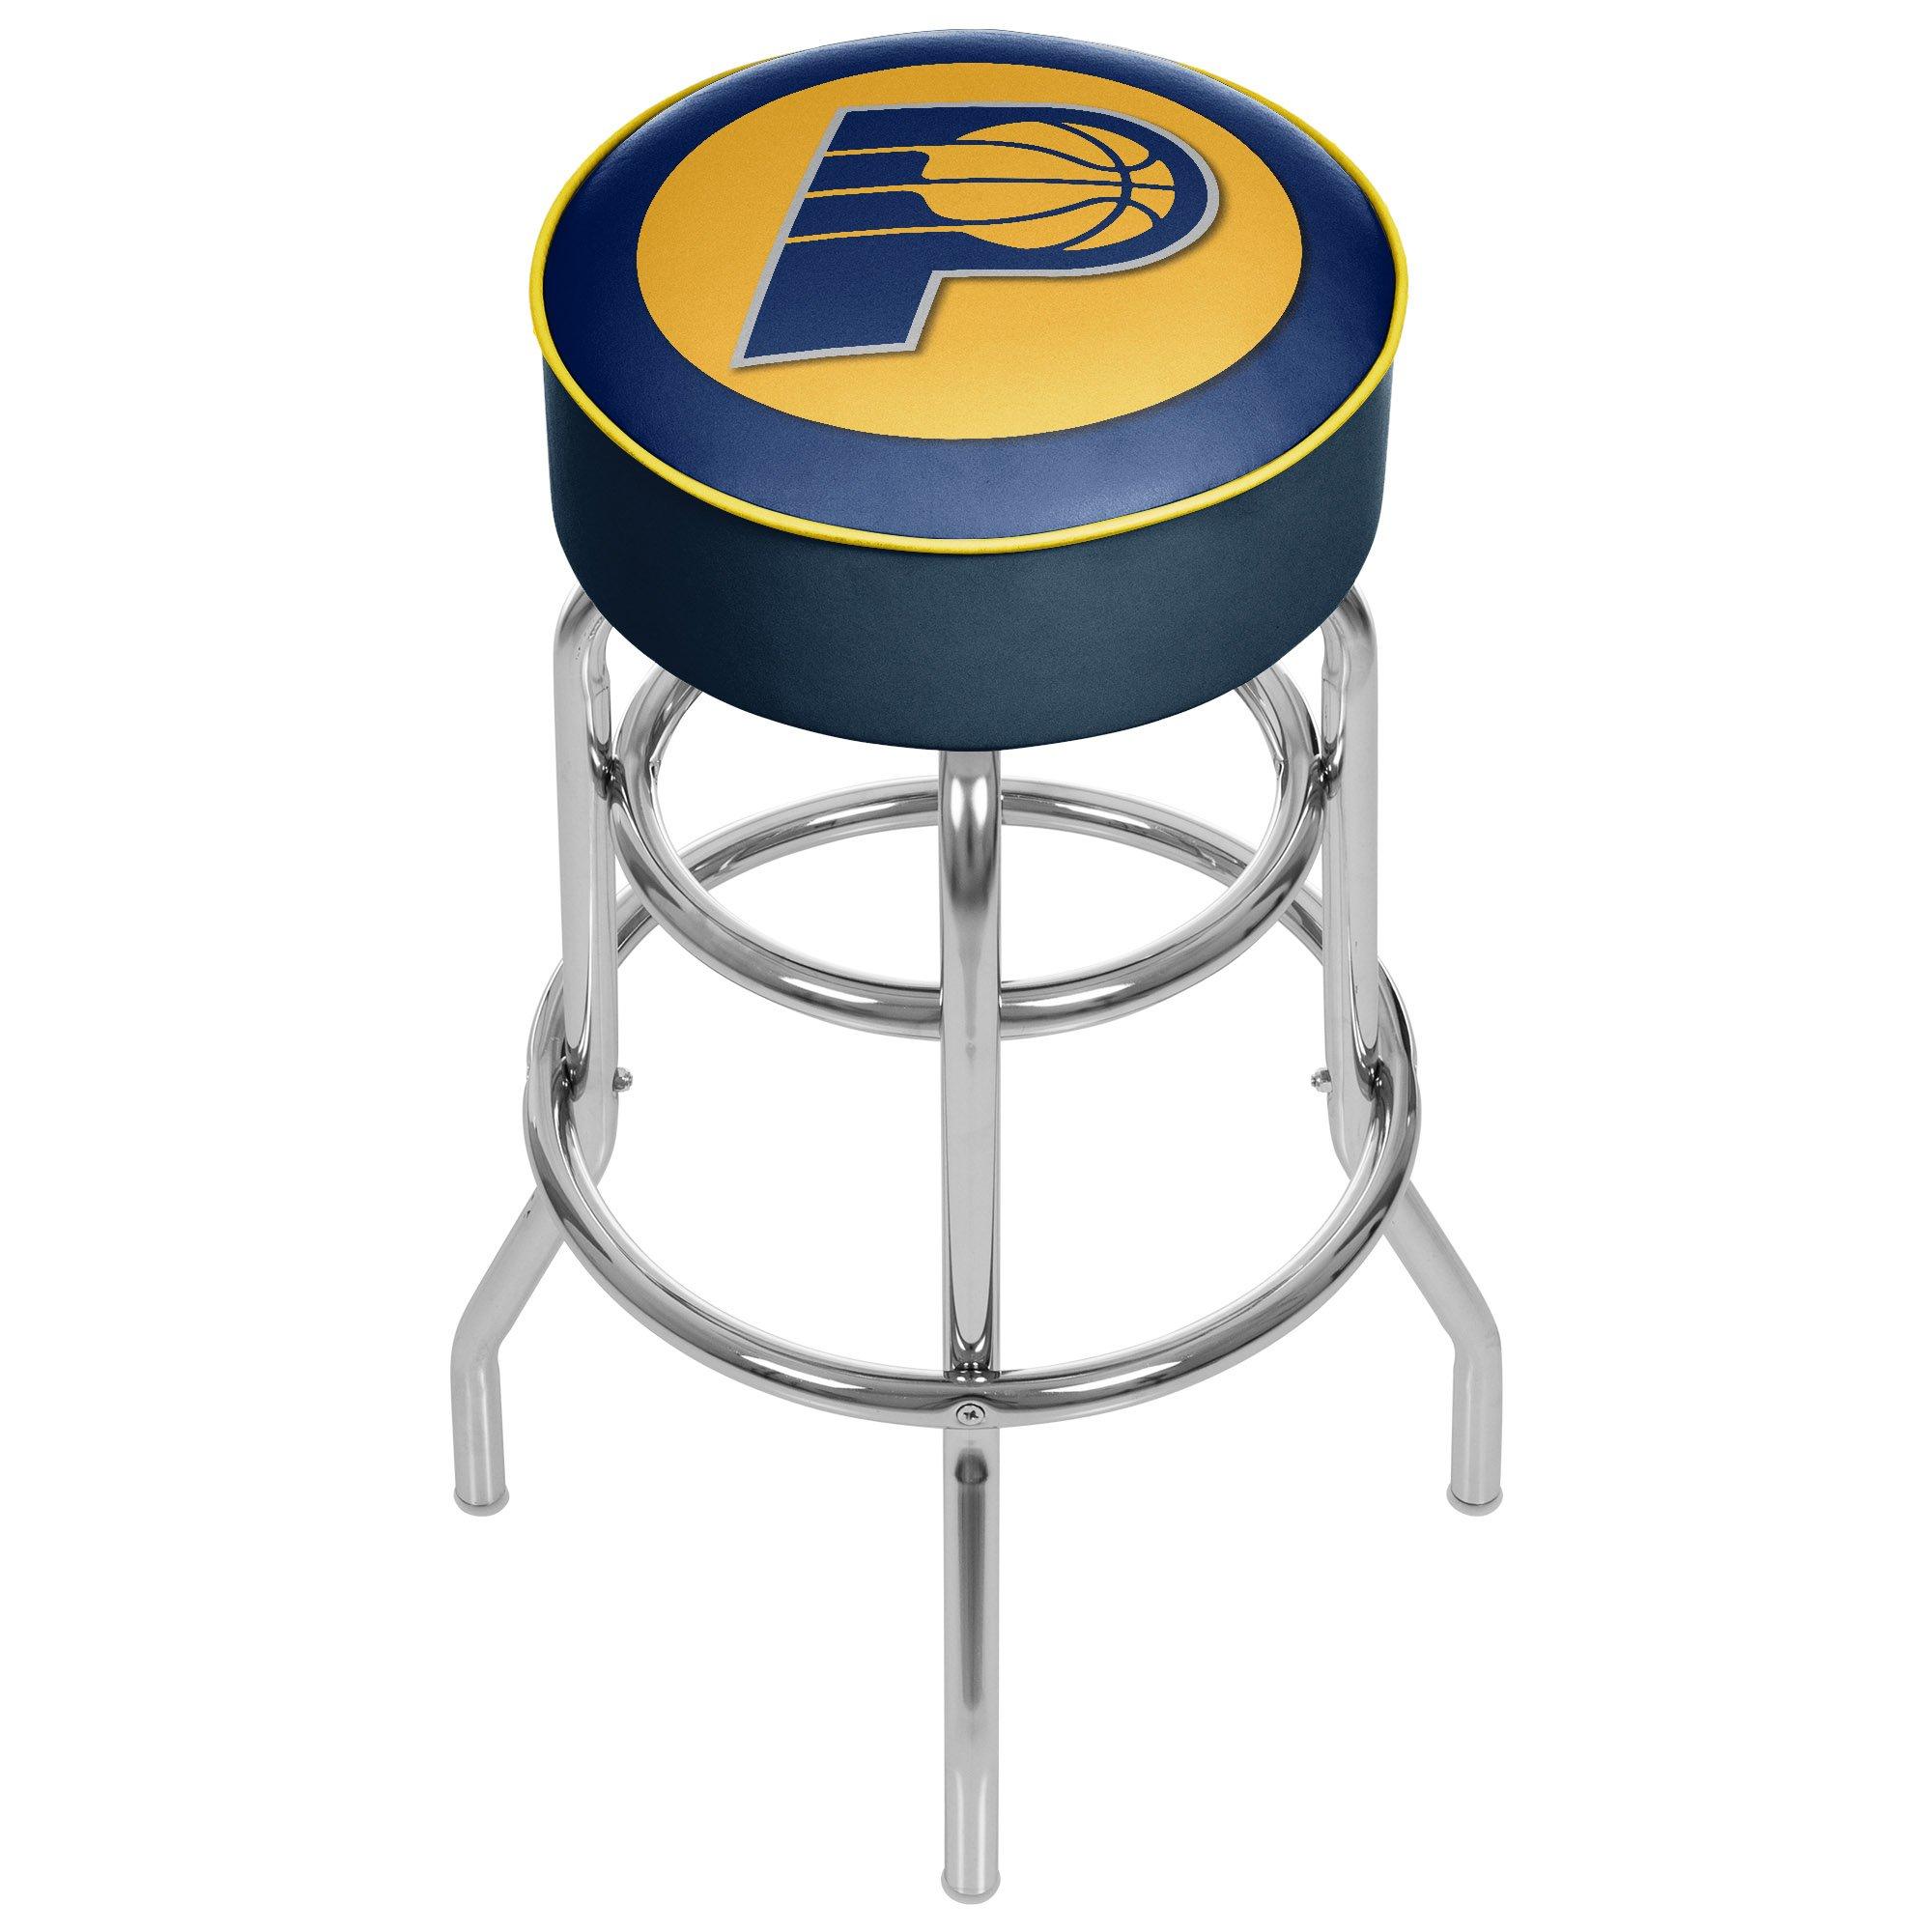 Trademark Gameroom NBA Indiana Pacers Padded Swivel Bar Stool